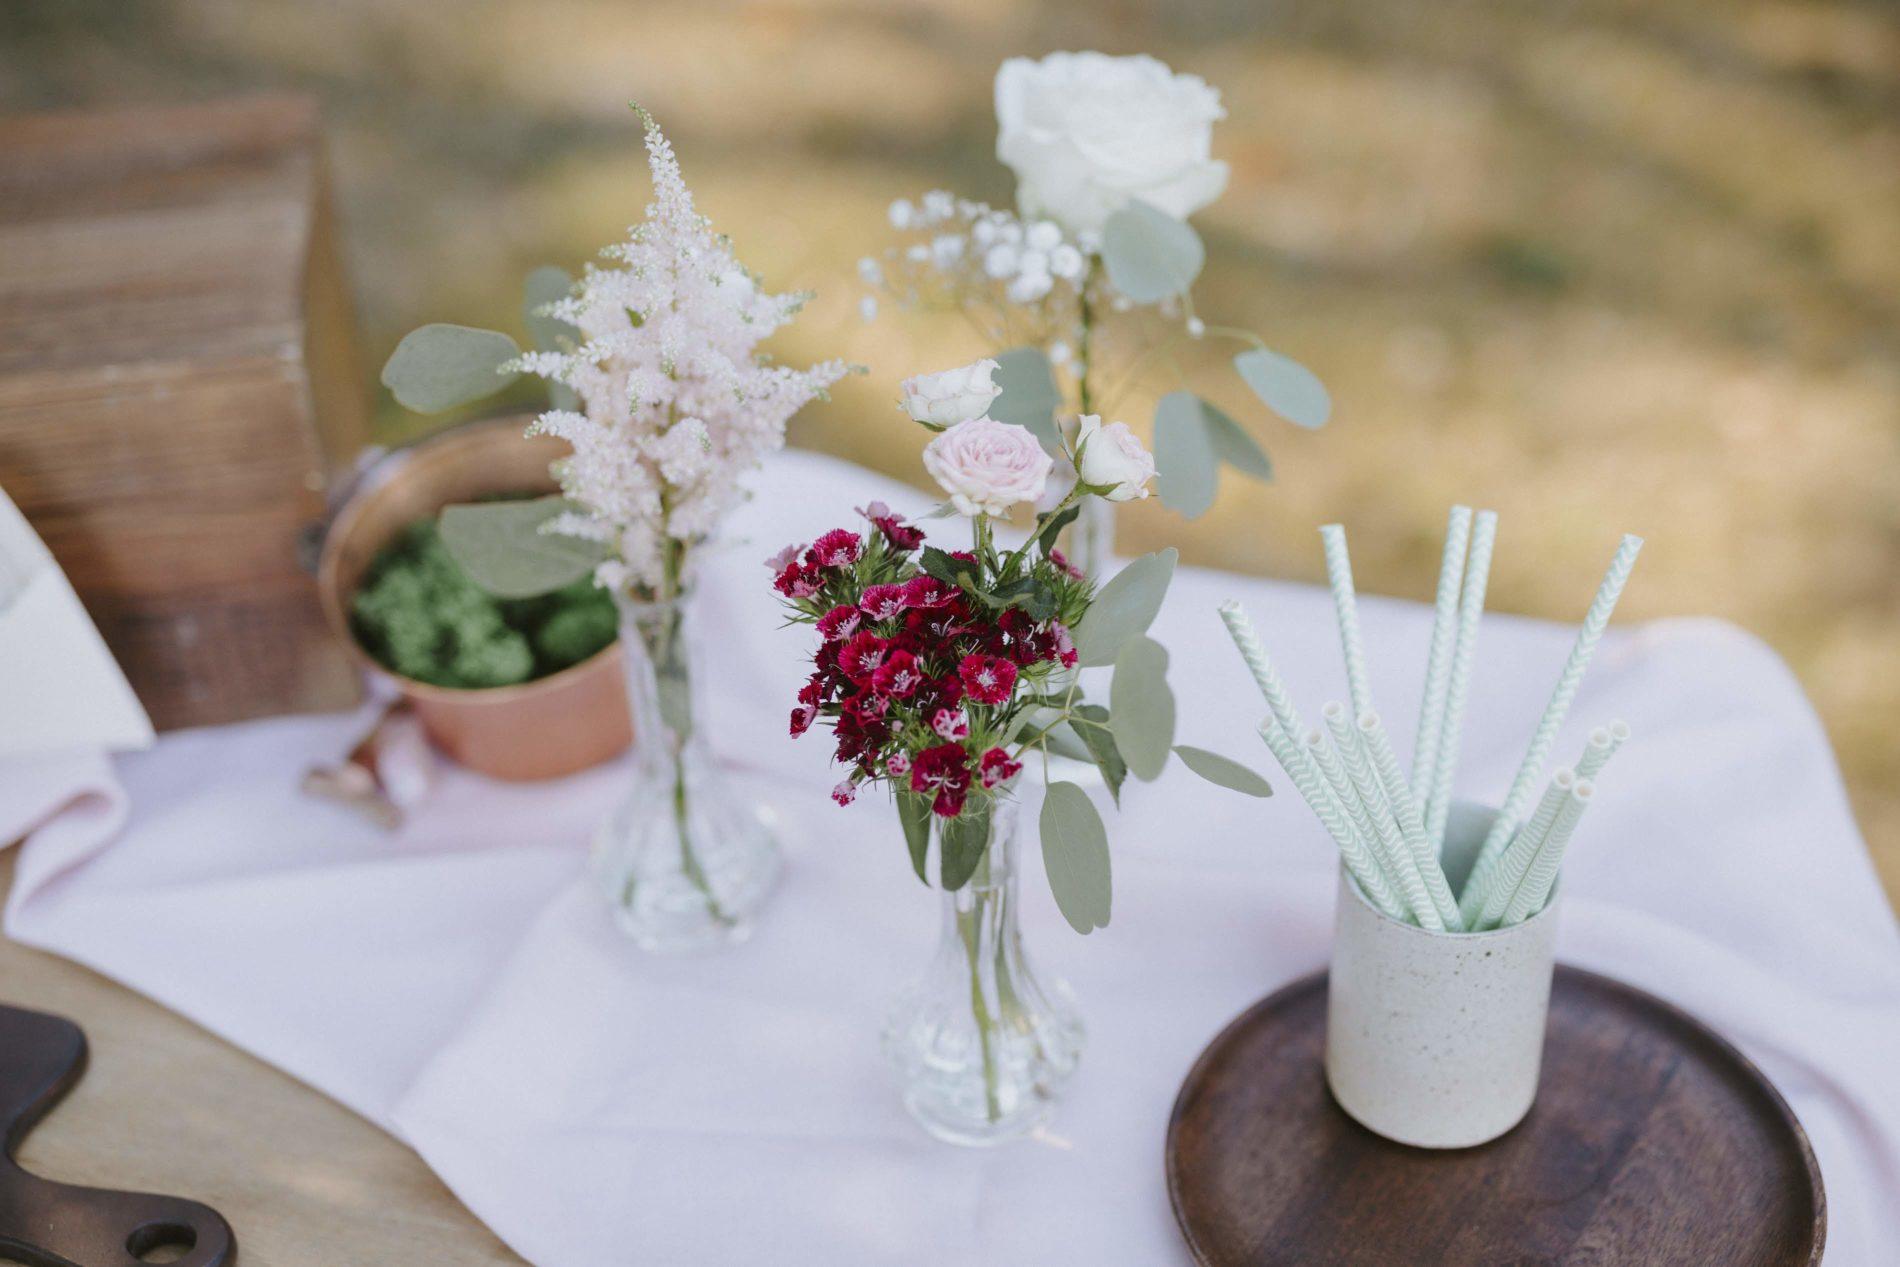 0009_01-CelineSereivuth-9-obonheurdesdames-decoration-mariage-location-Jordane-Chaillou